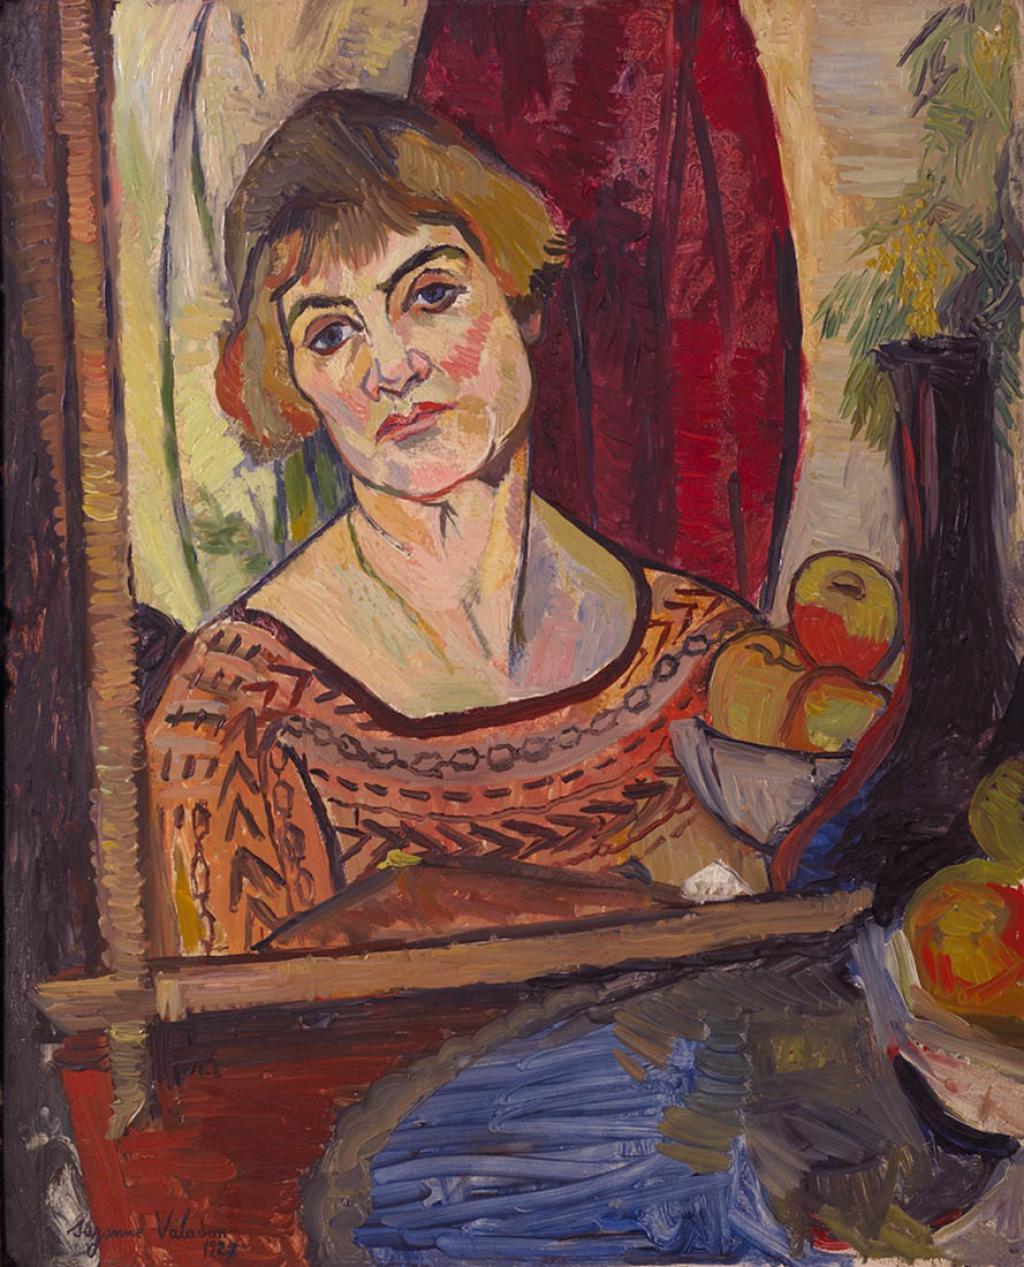 Suzanne Valadon self-portrait-1927 Musee Maurice Utrillo, Sannois